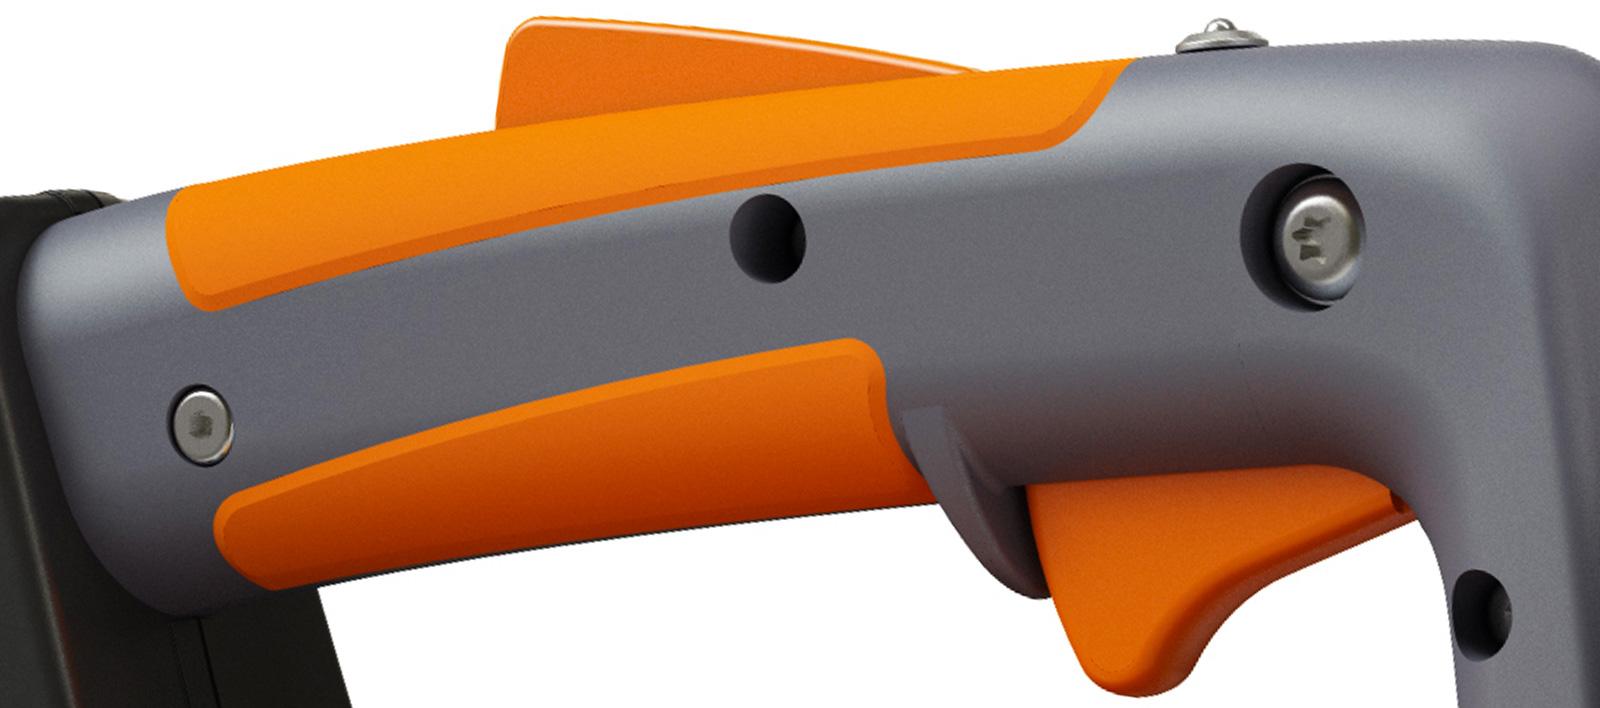 Selion-C21-HD-4-securites-innovantes